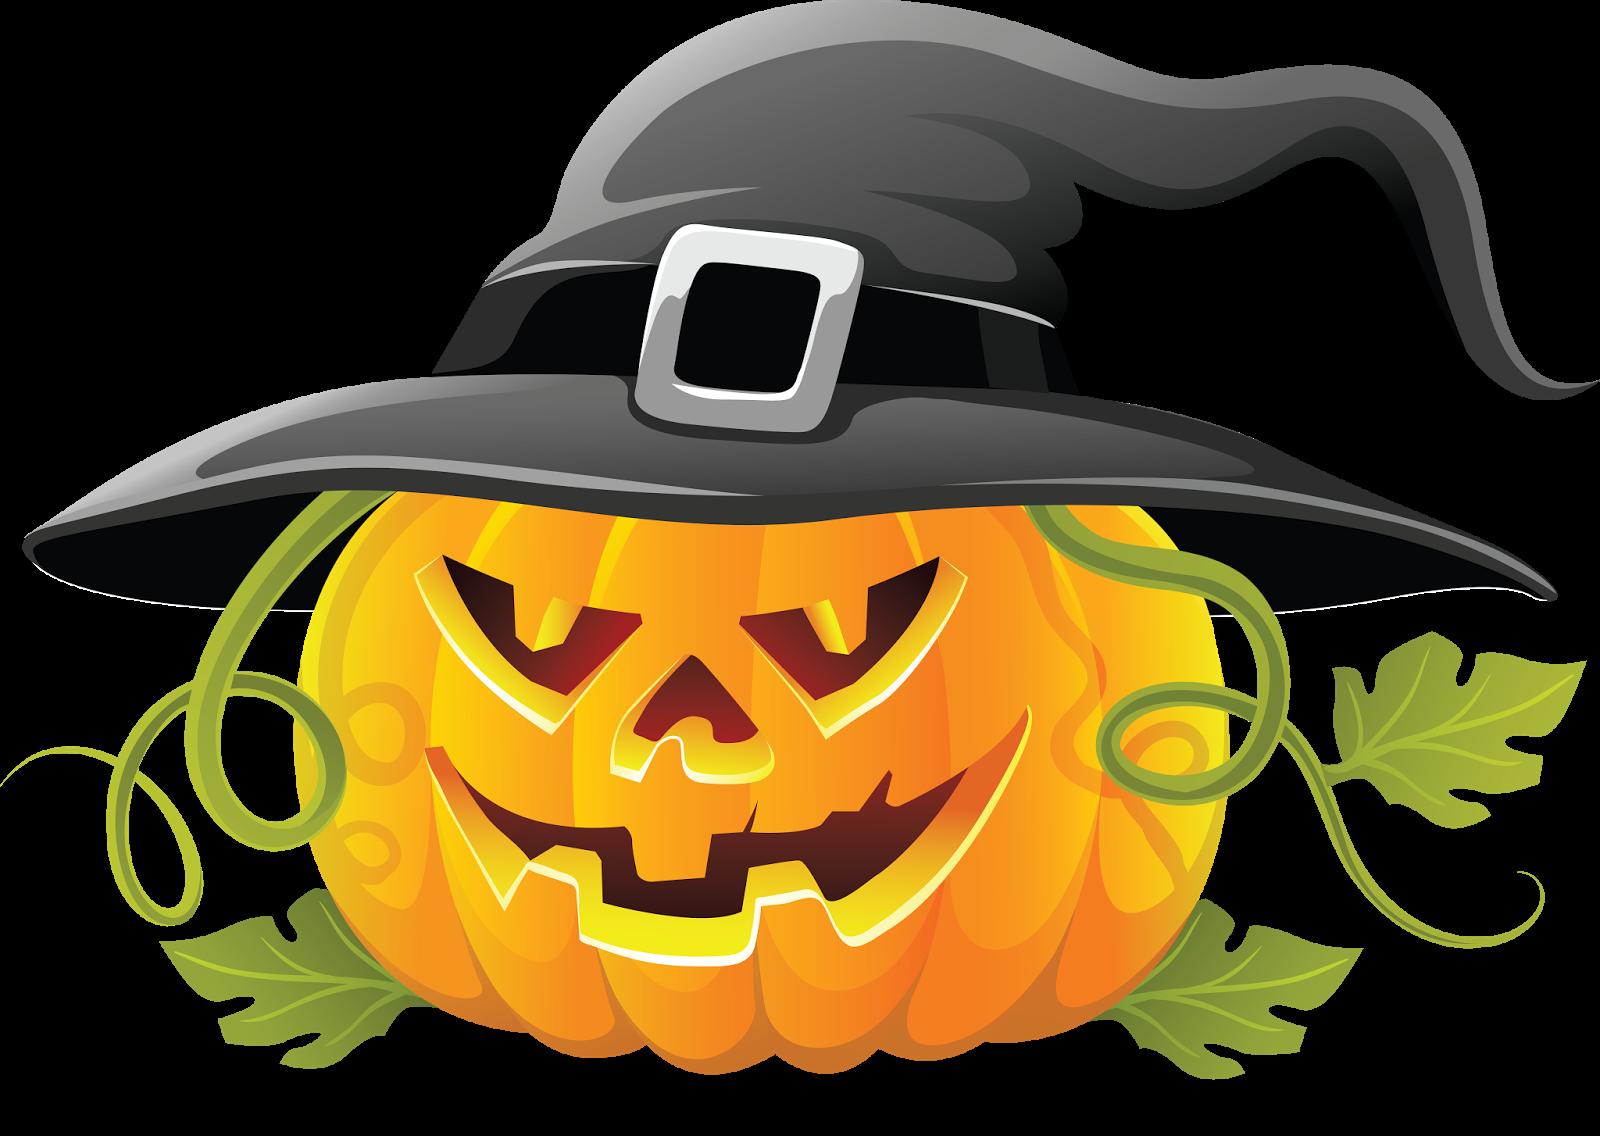 Cub scout pack la. Clipart halloween carnival